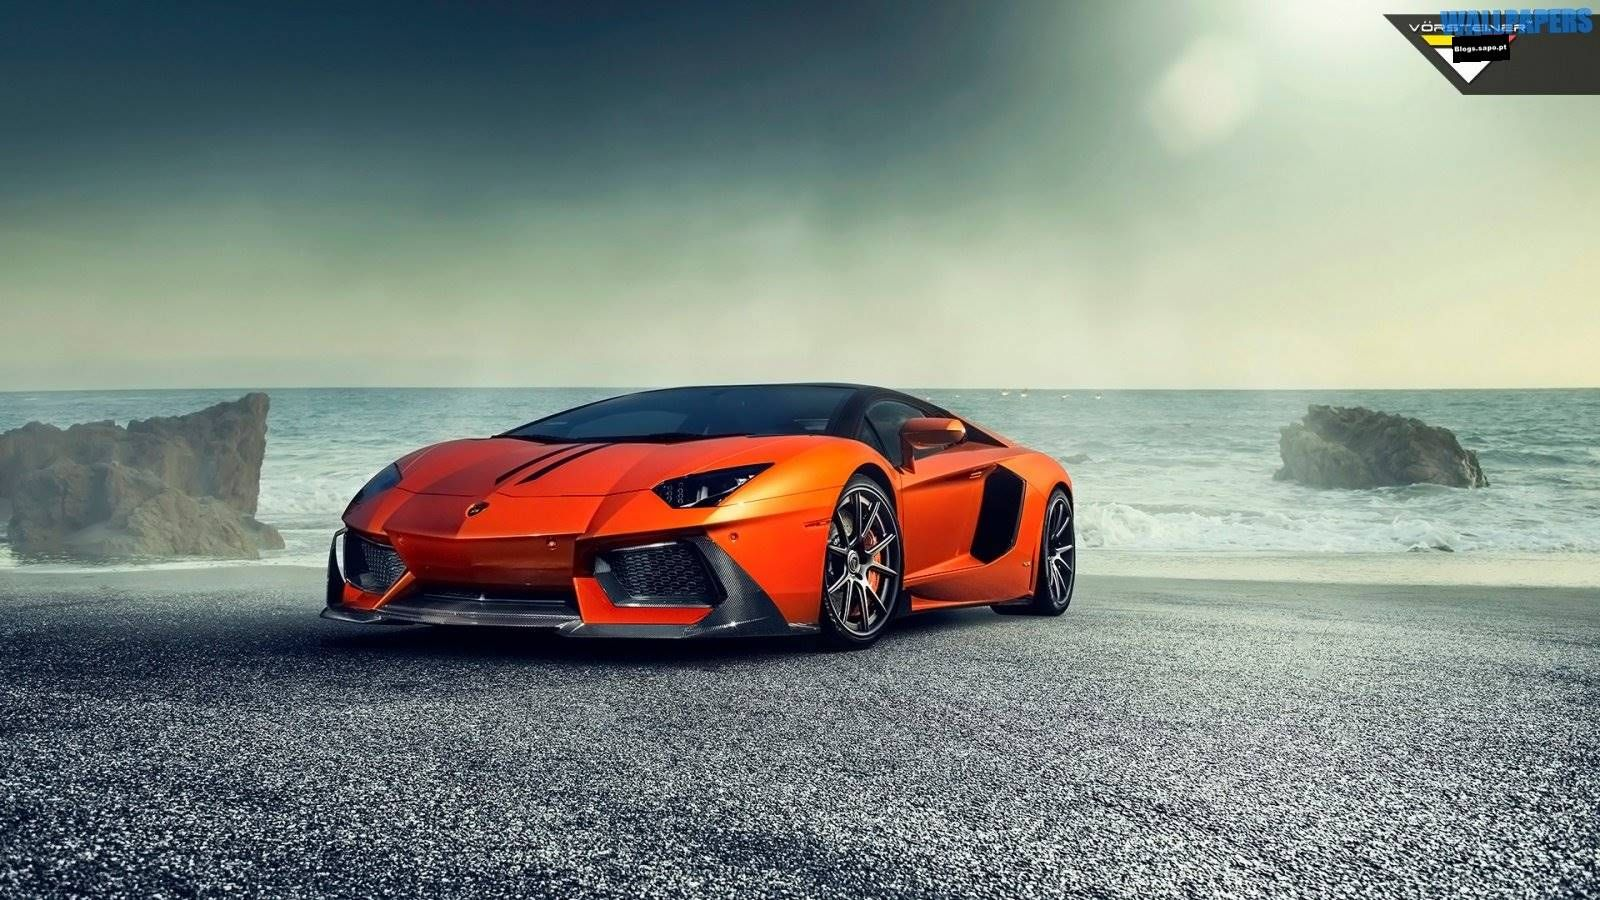 Black Mate Lamborghini Aventador Ruedas Pinteresantes Pinterest Lamborghini Desktop Backgrounds And Lamborghini Cars